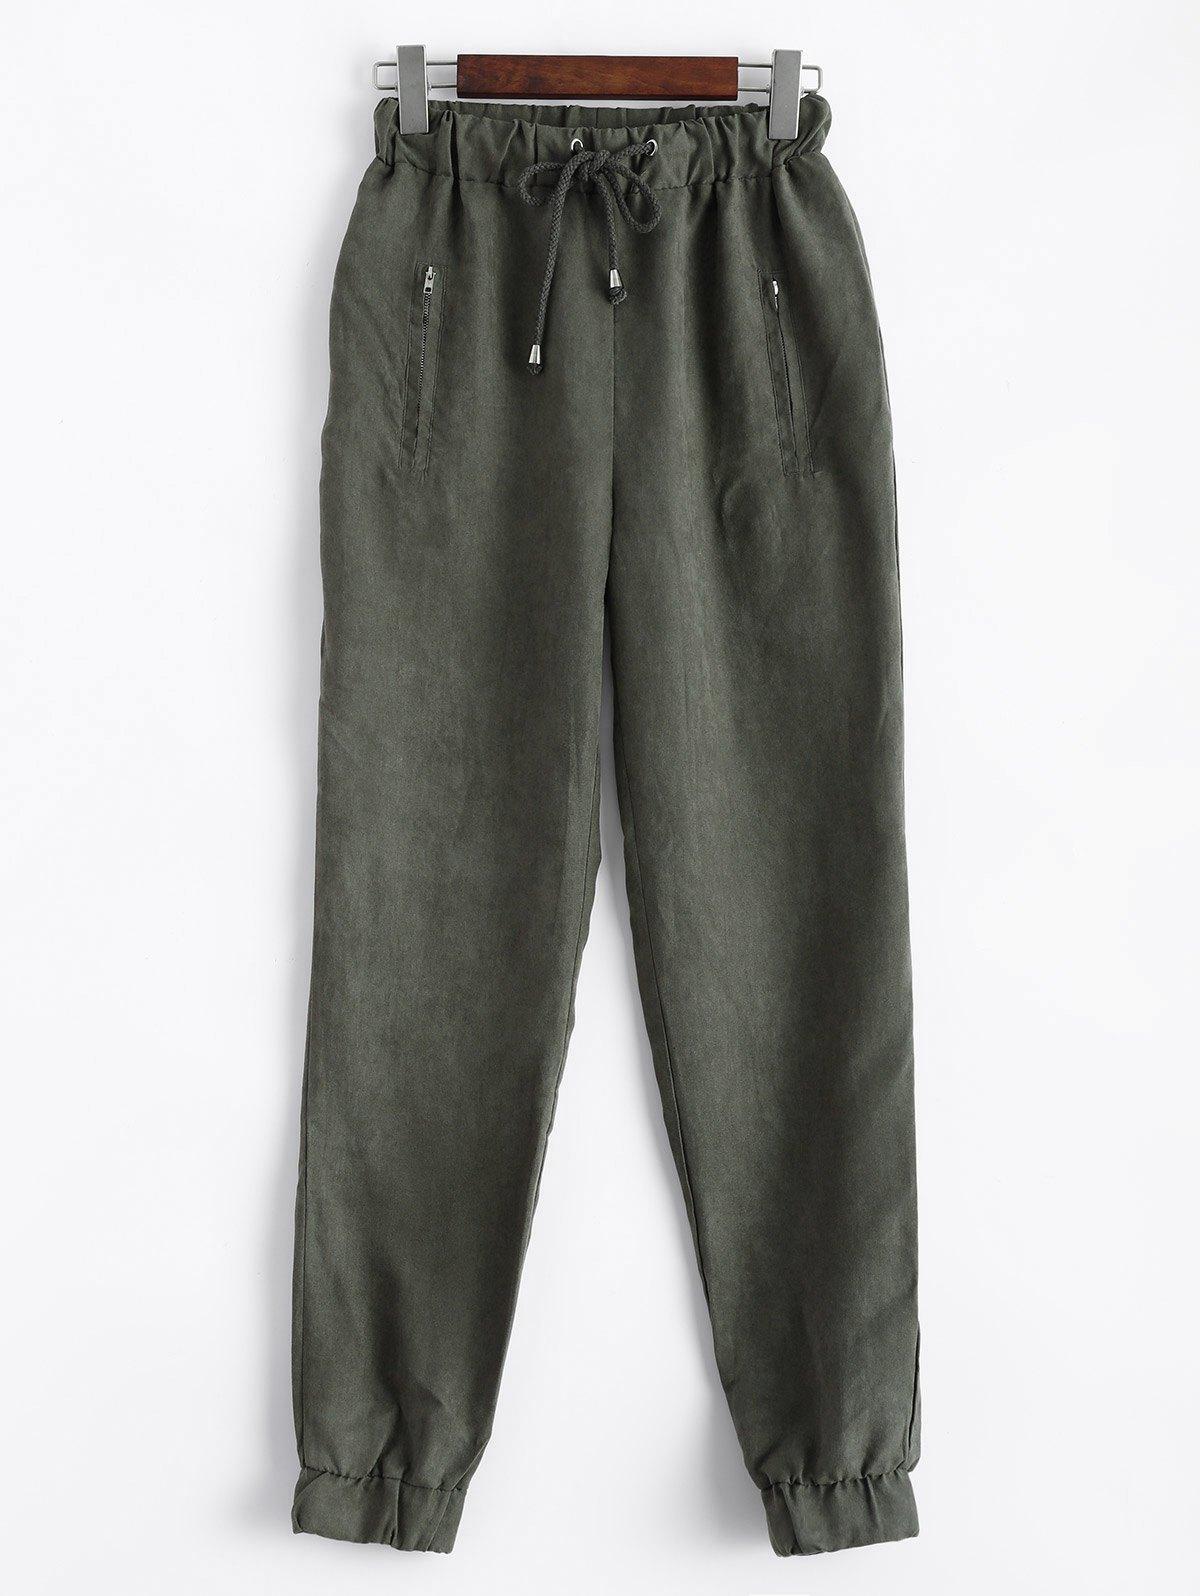 Joggers Pants